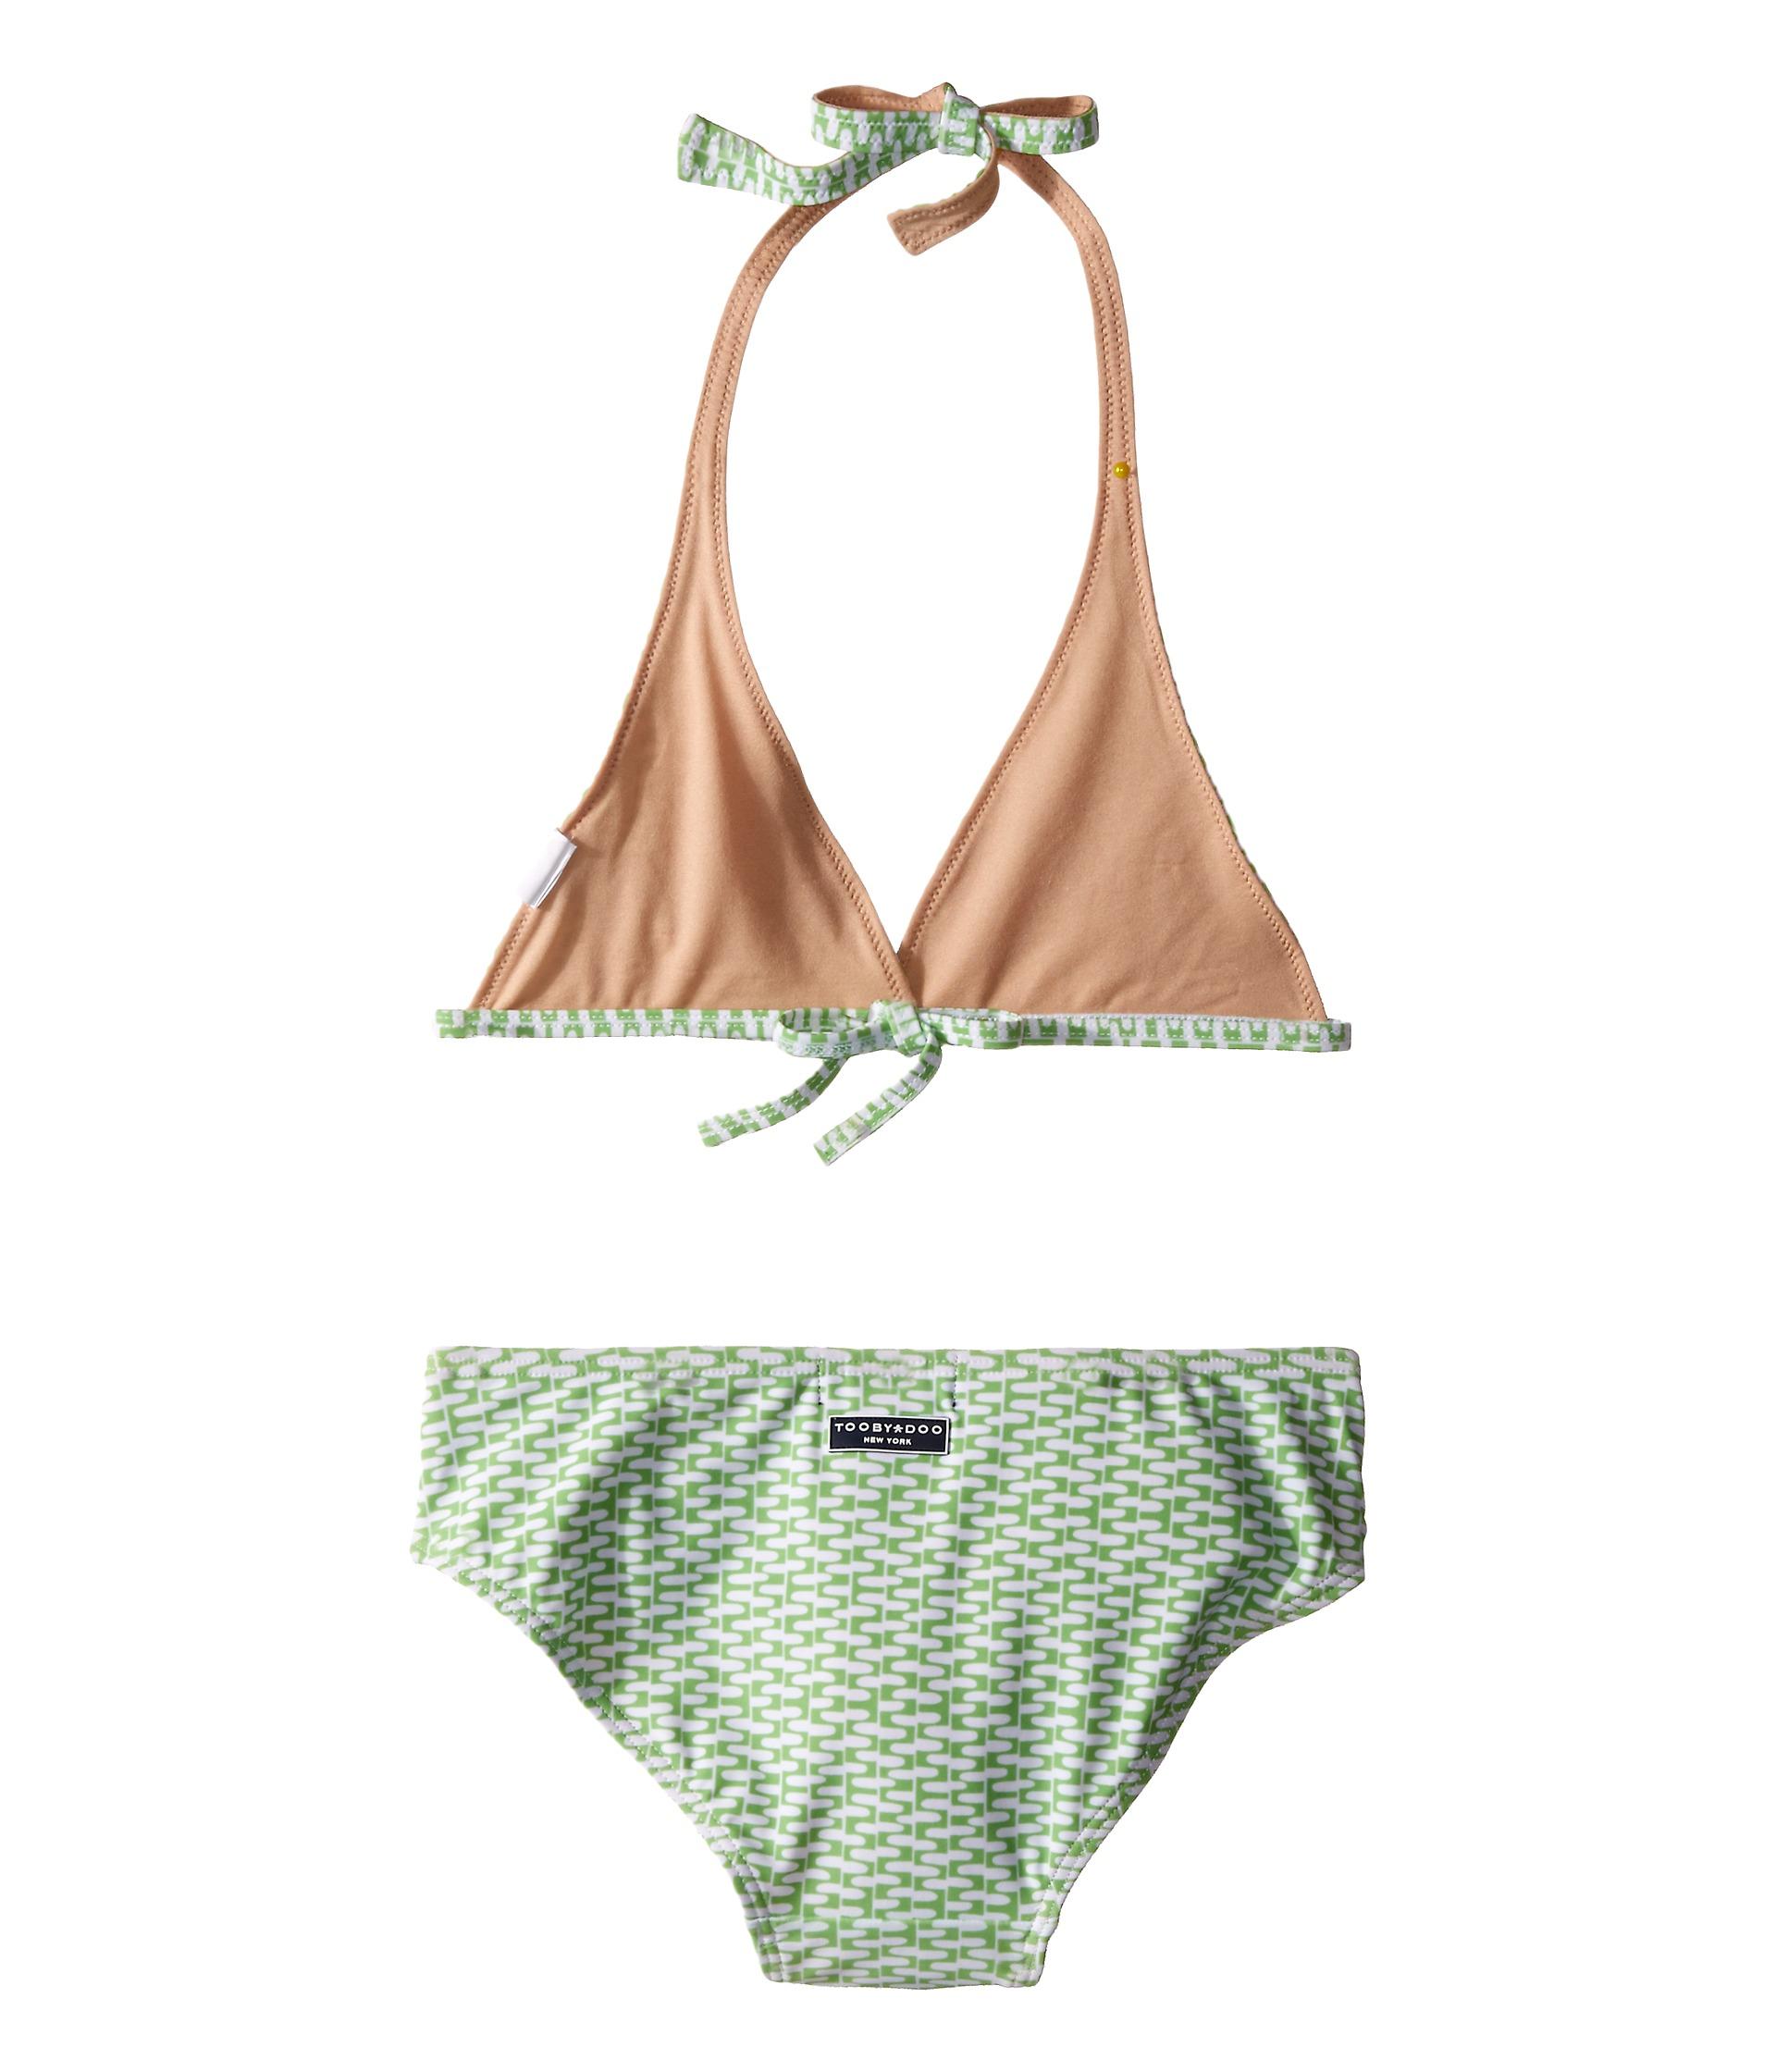 Toobydoo Green/White String Bikini (Infant/Toddler/Little